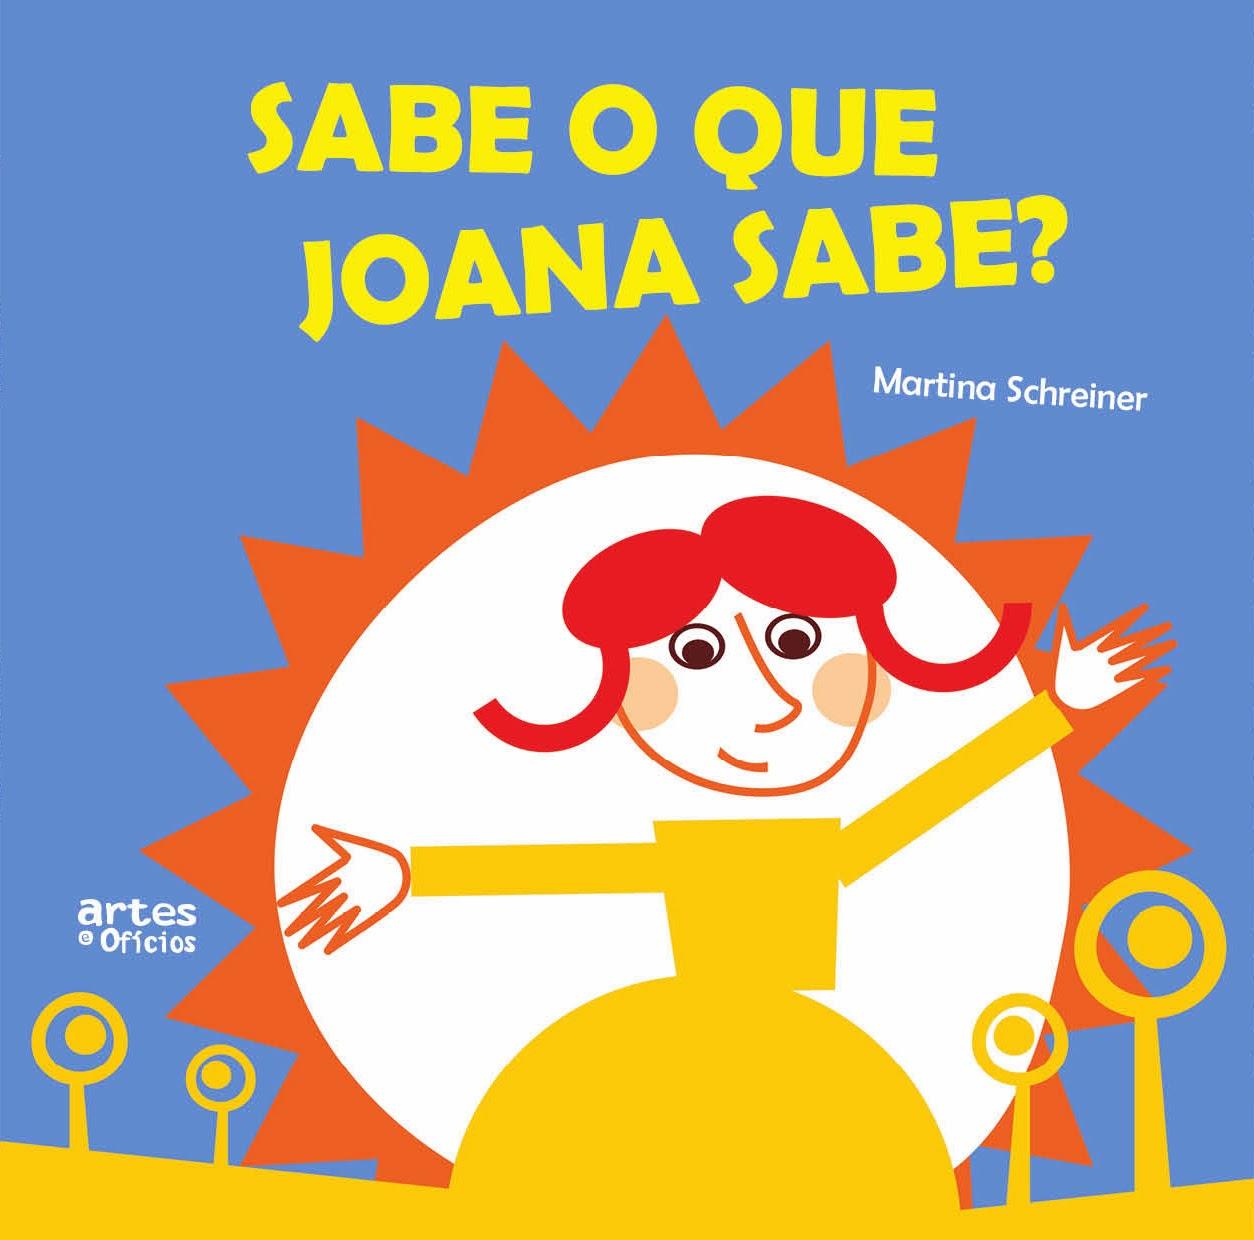 Sabe o que Joana sabe?